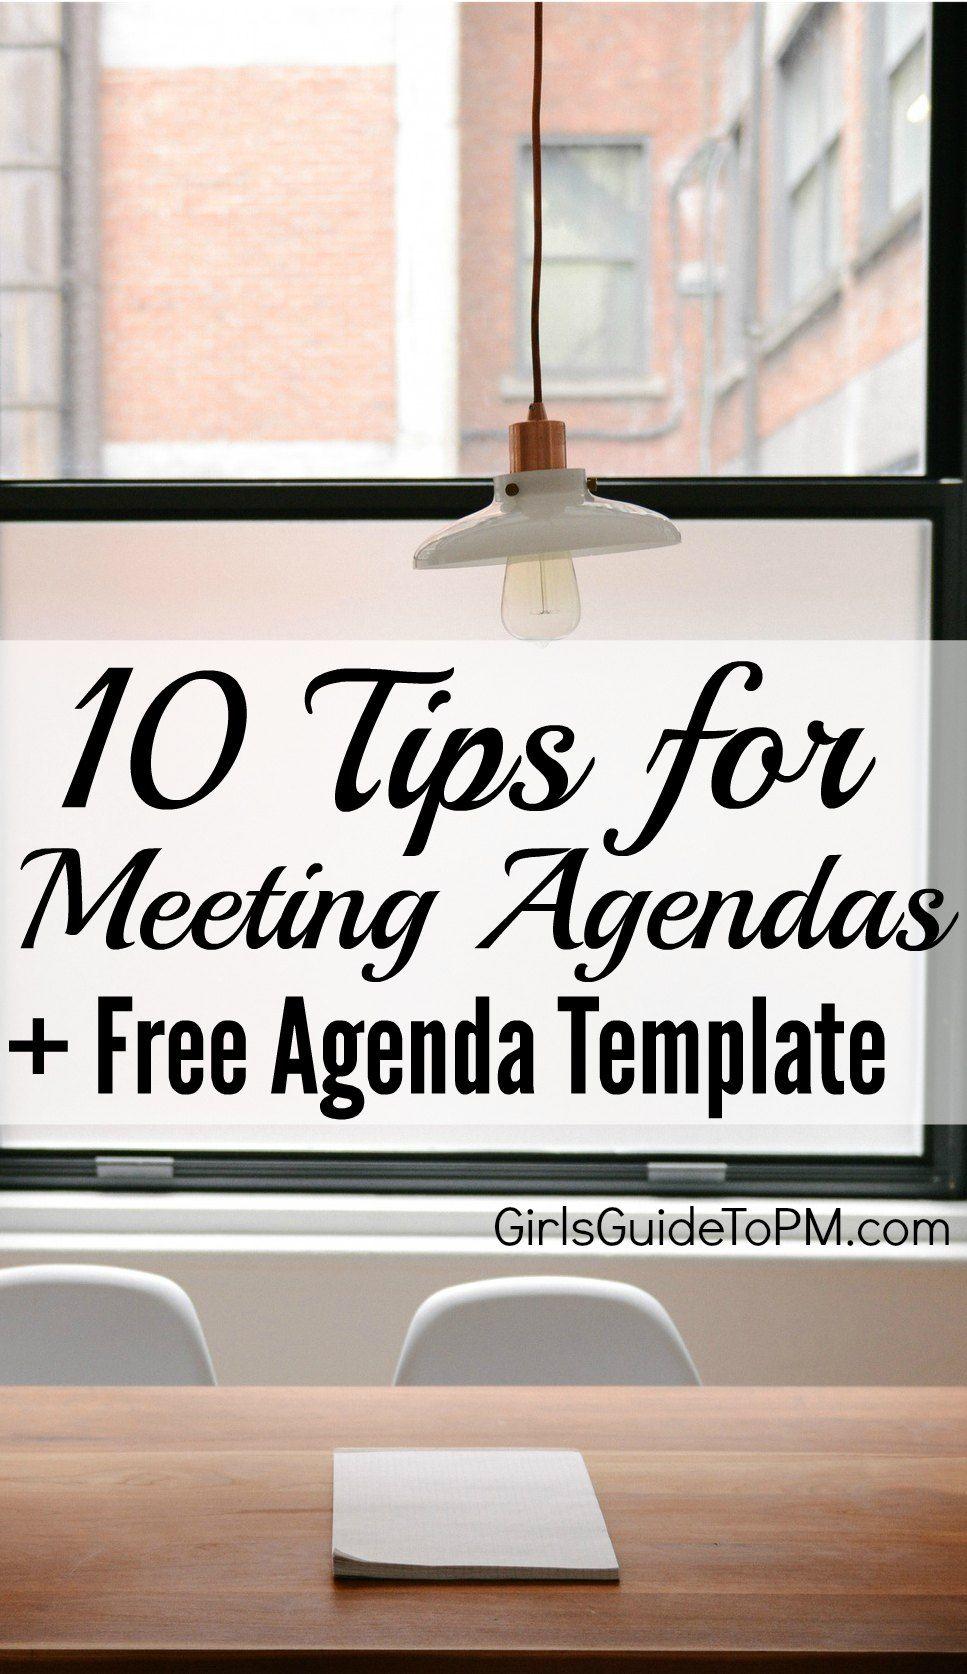 10 tips for good meeting agendas   free agenda template